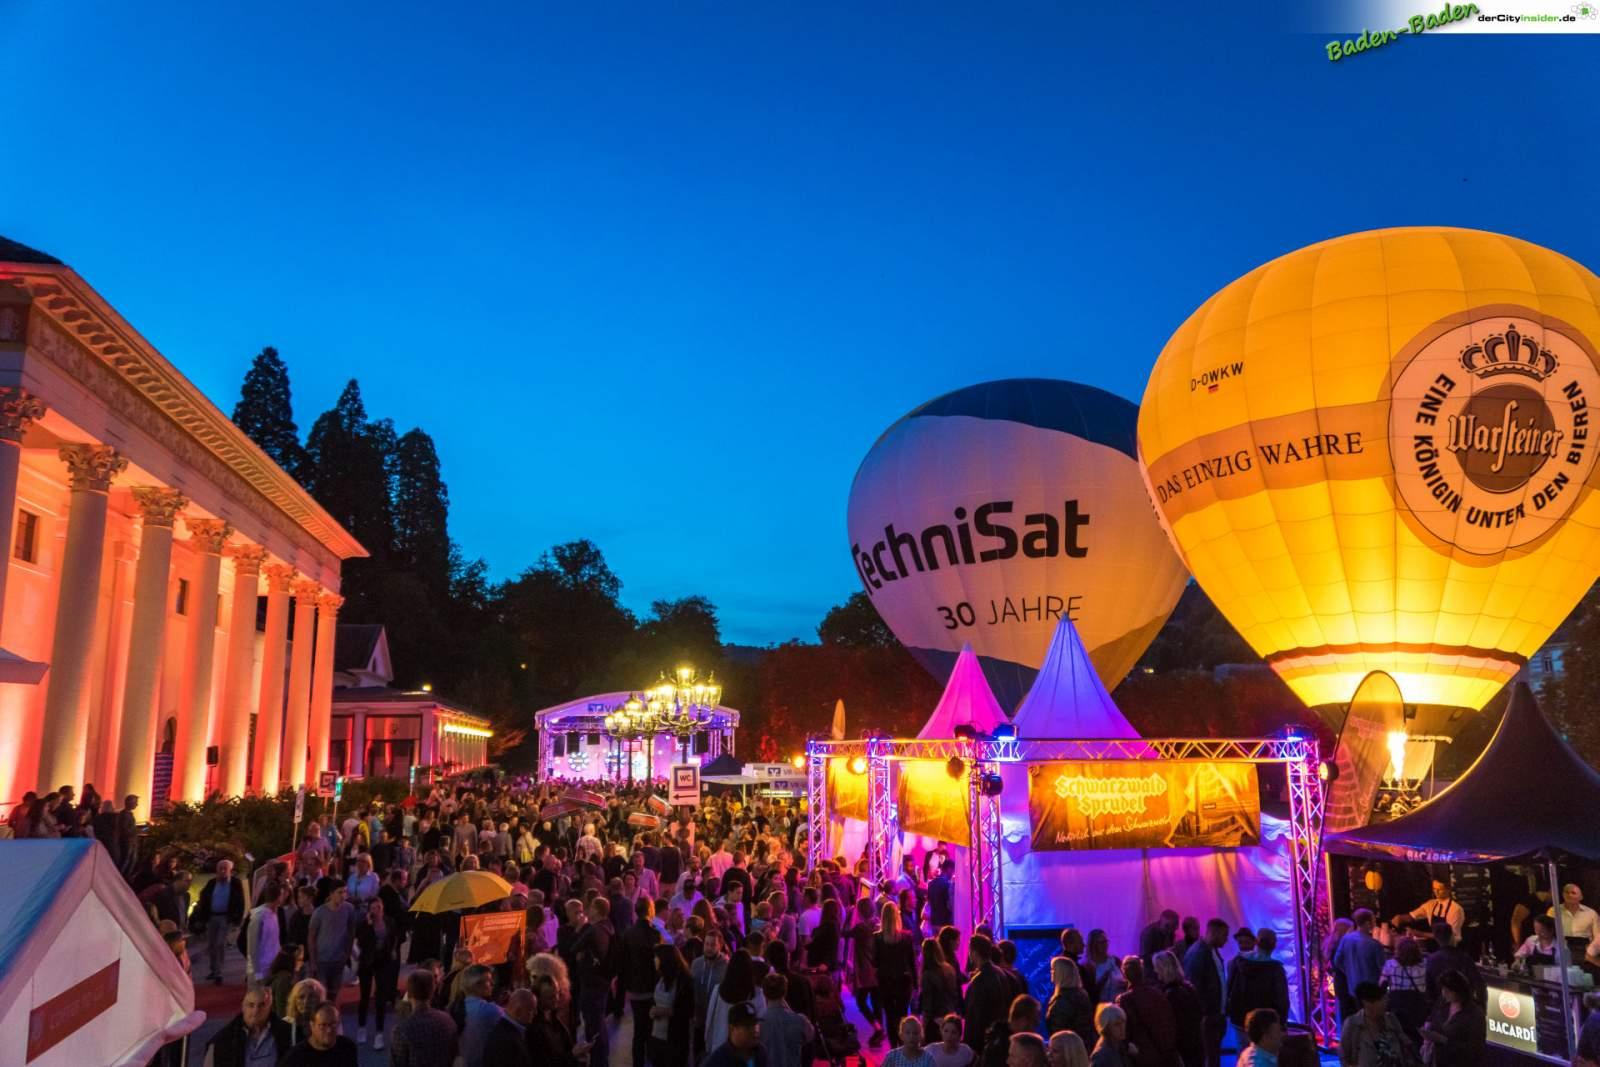 New Pop Festival Baden Baden